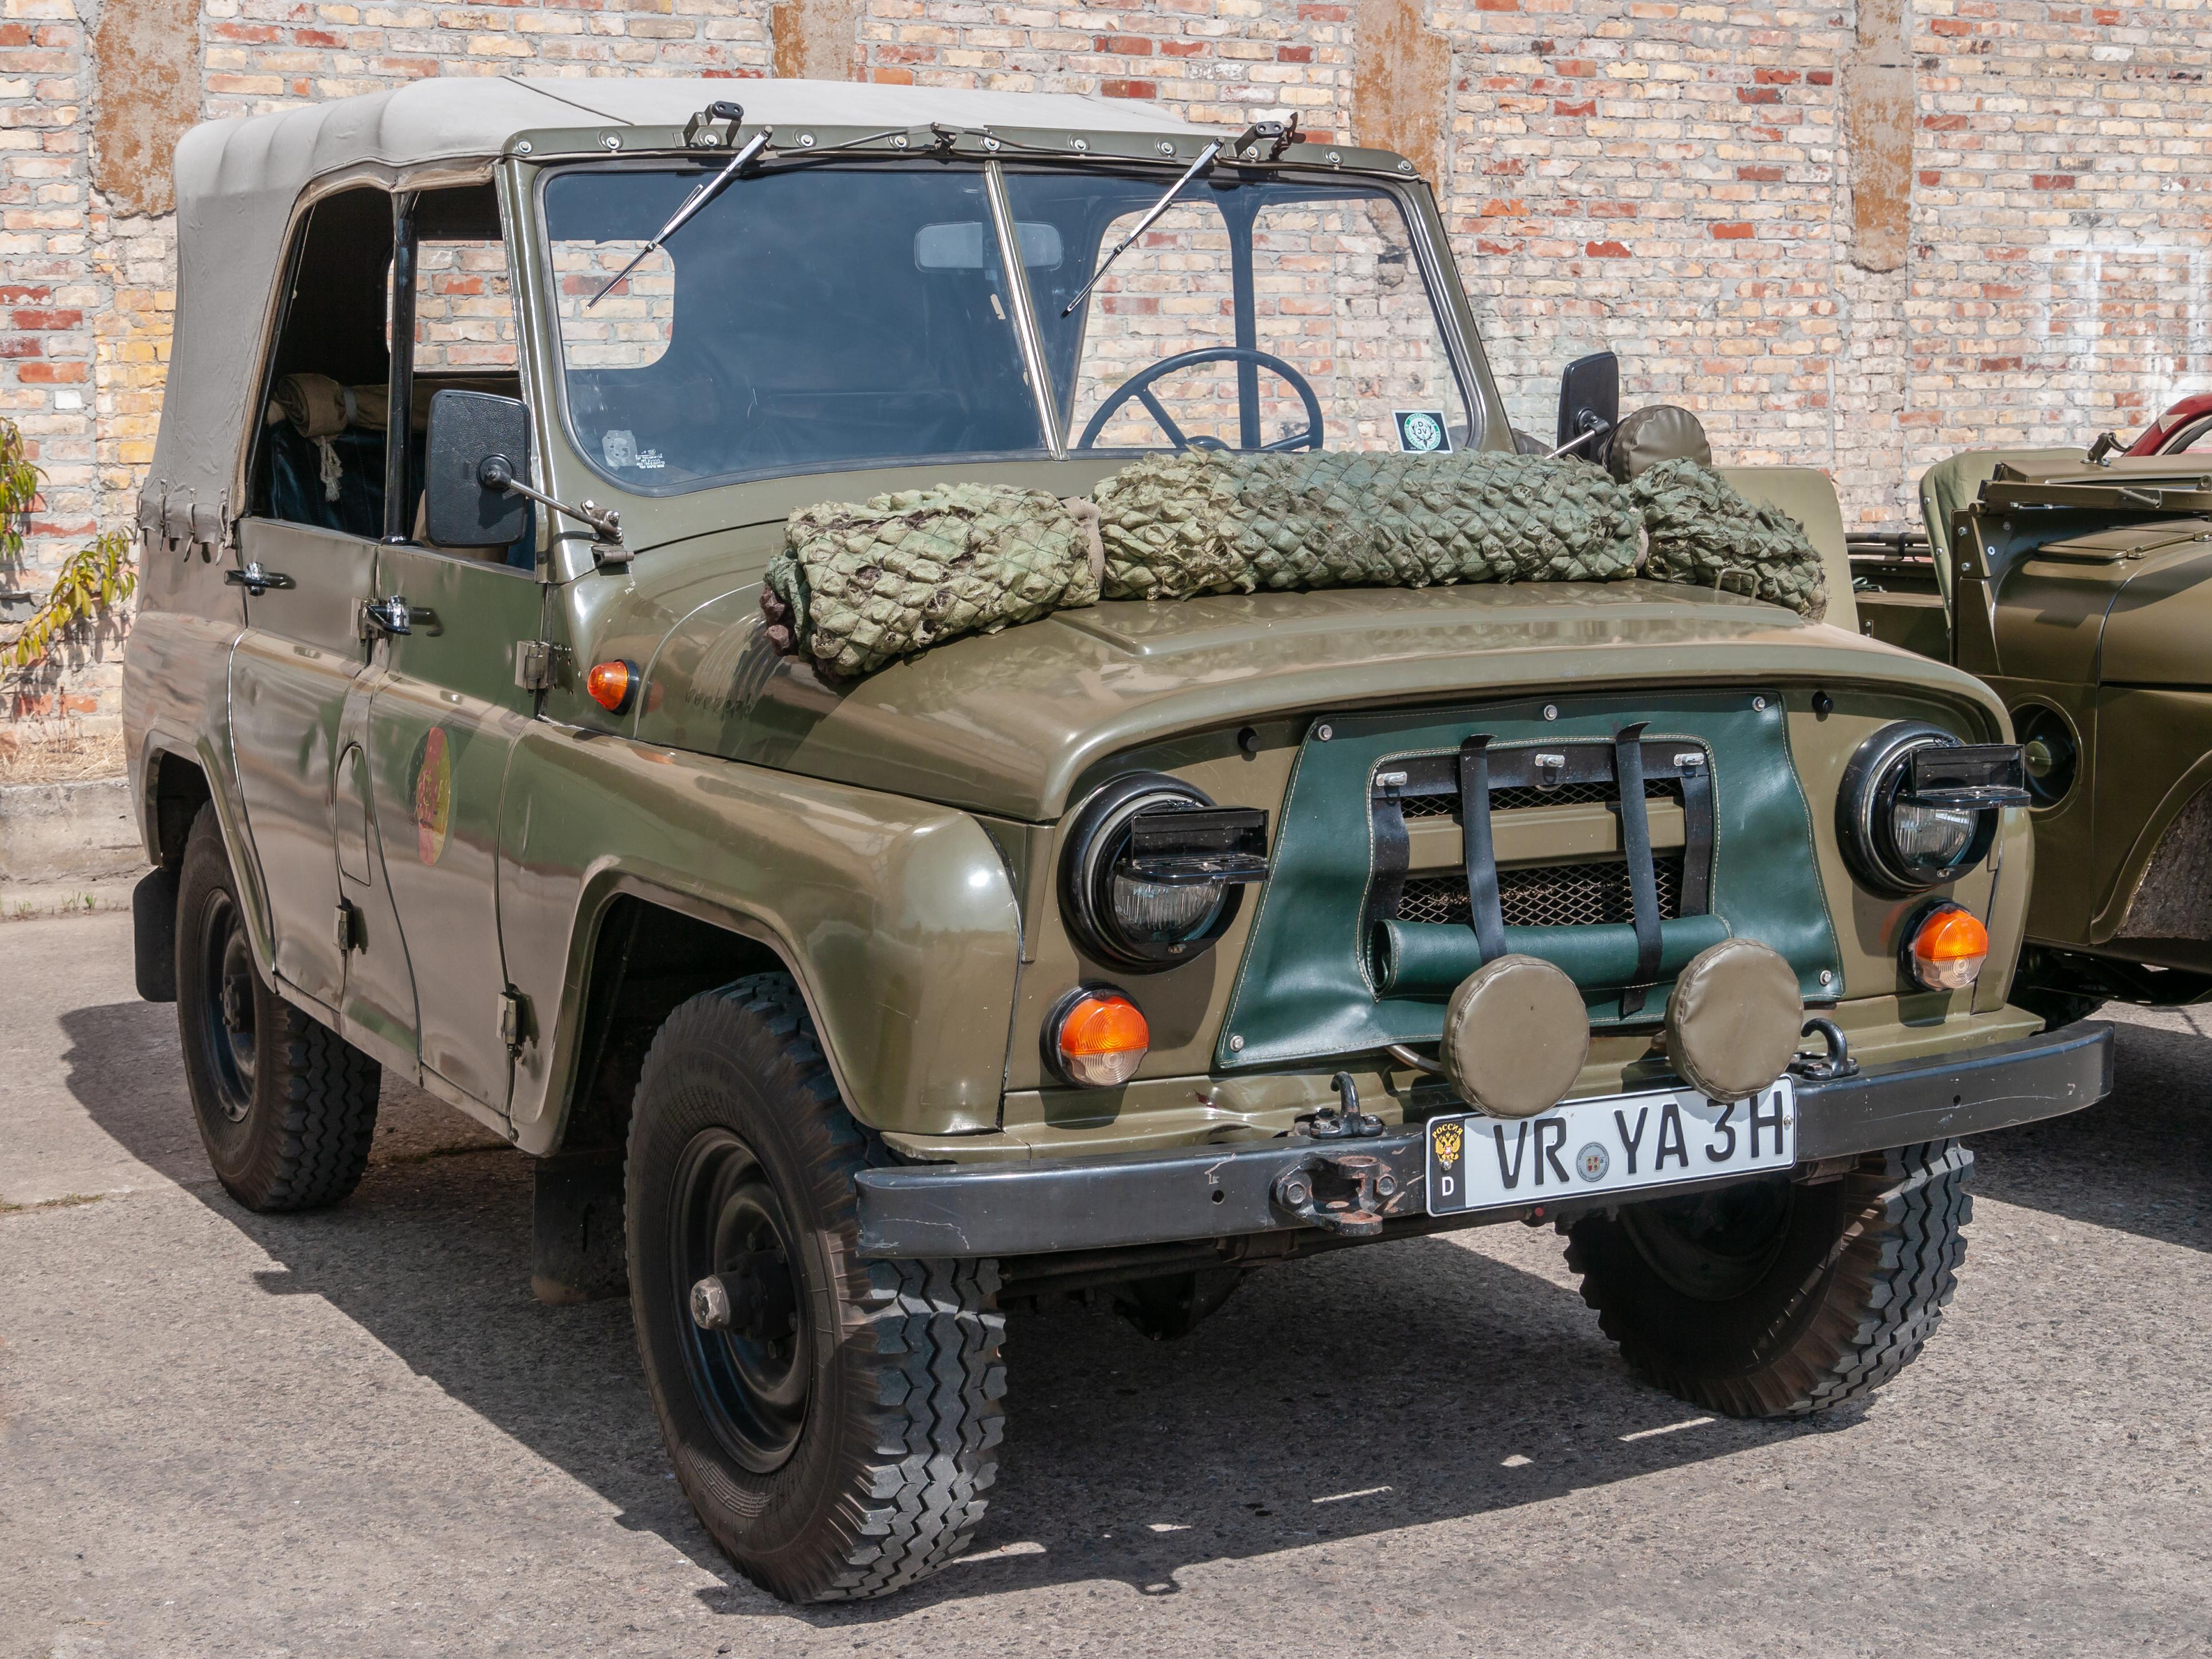 File:UAZ-469, 12. Internationales Maritimes-Fahrzeugtreffen,  Ribnitz-Damgarten